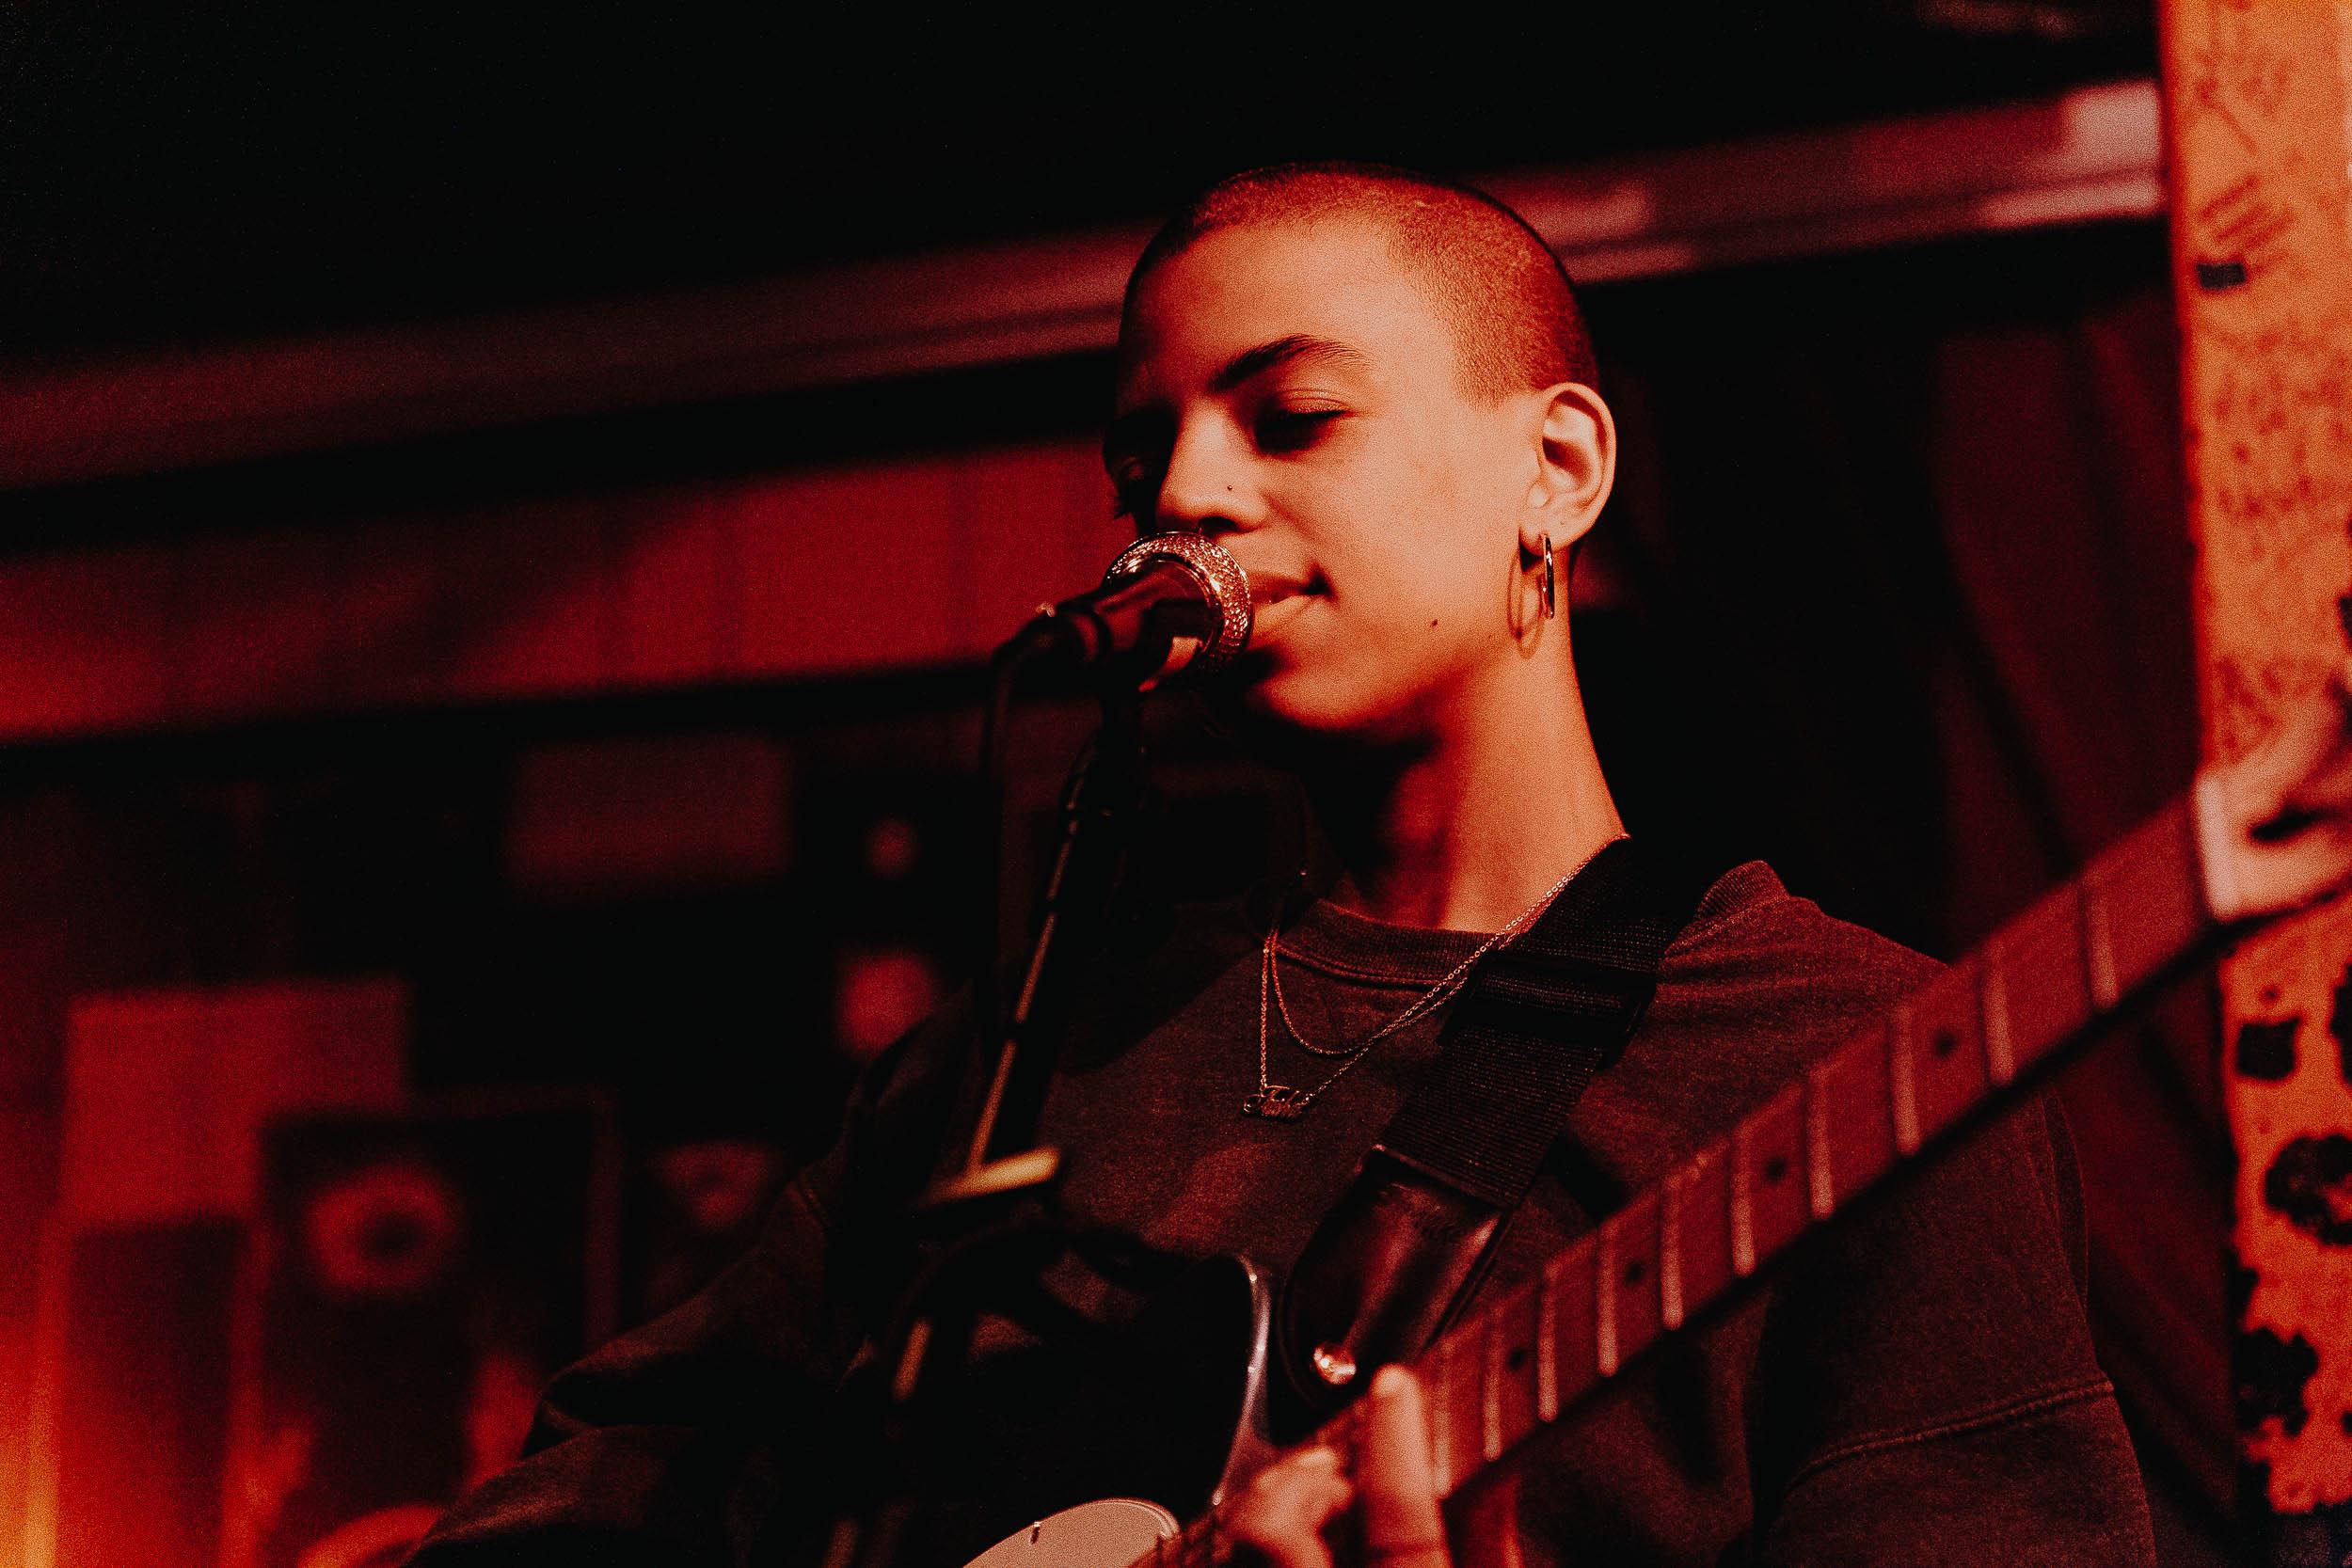 Tasha at Songbyrd (Photo by Mauricio Castro)